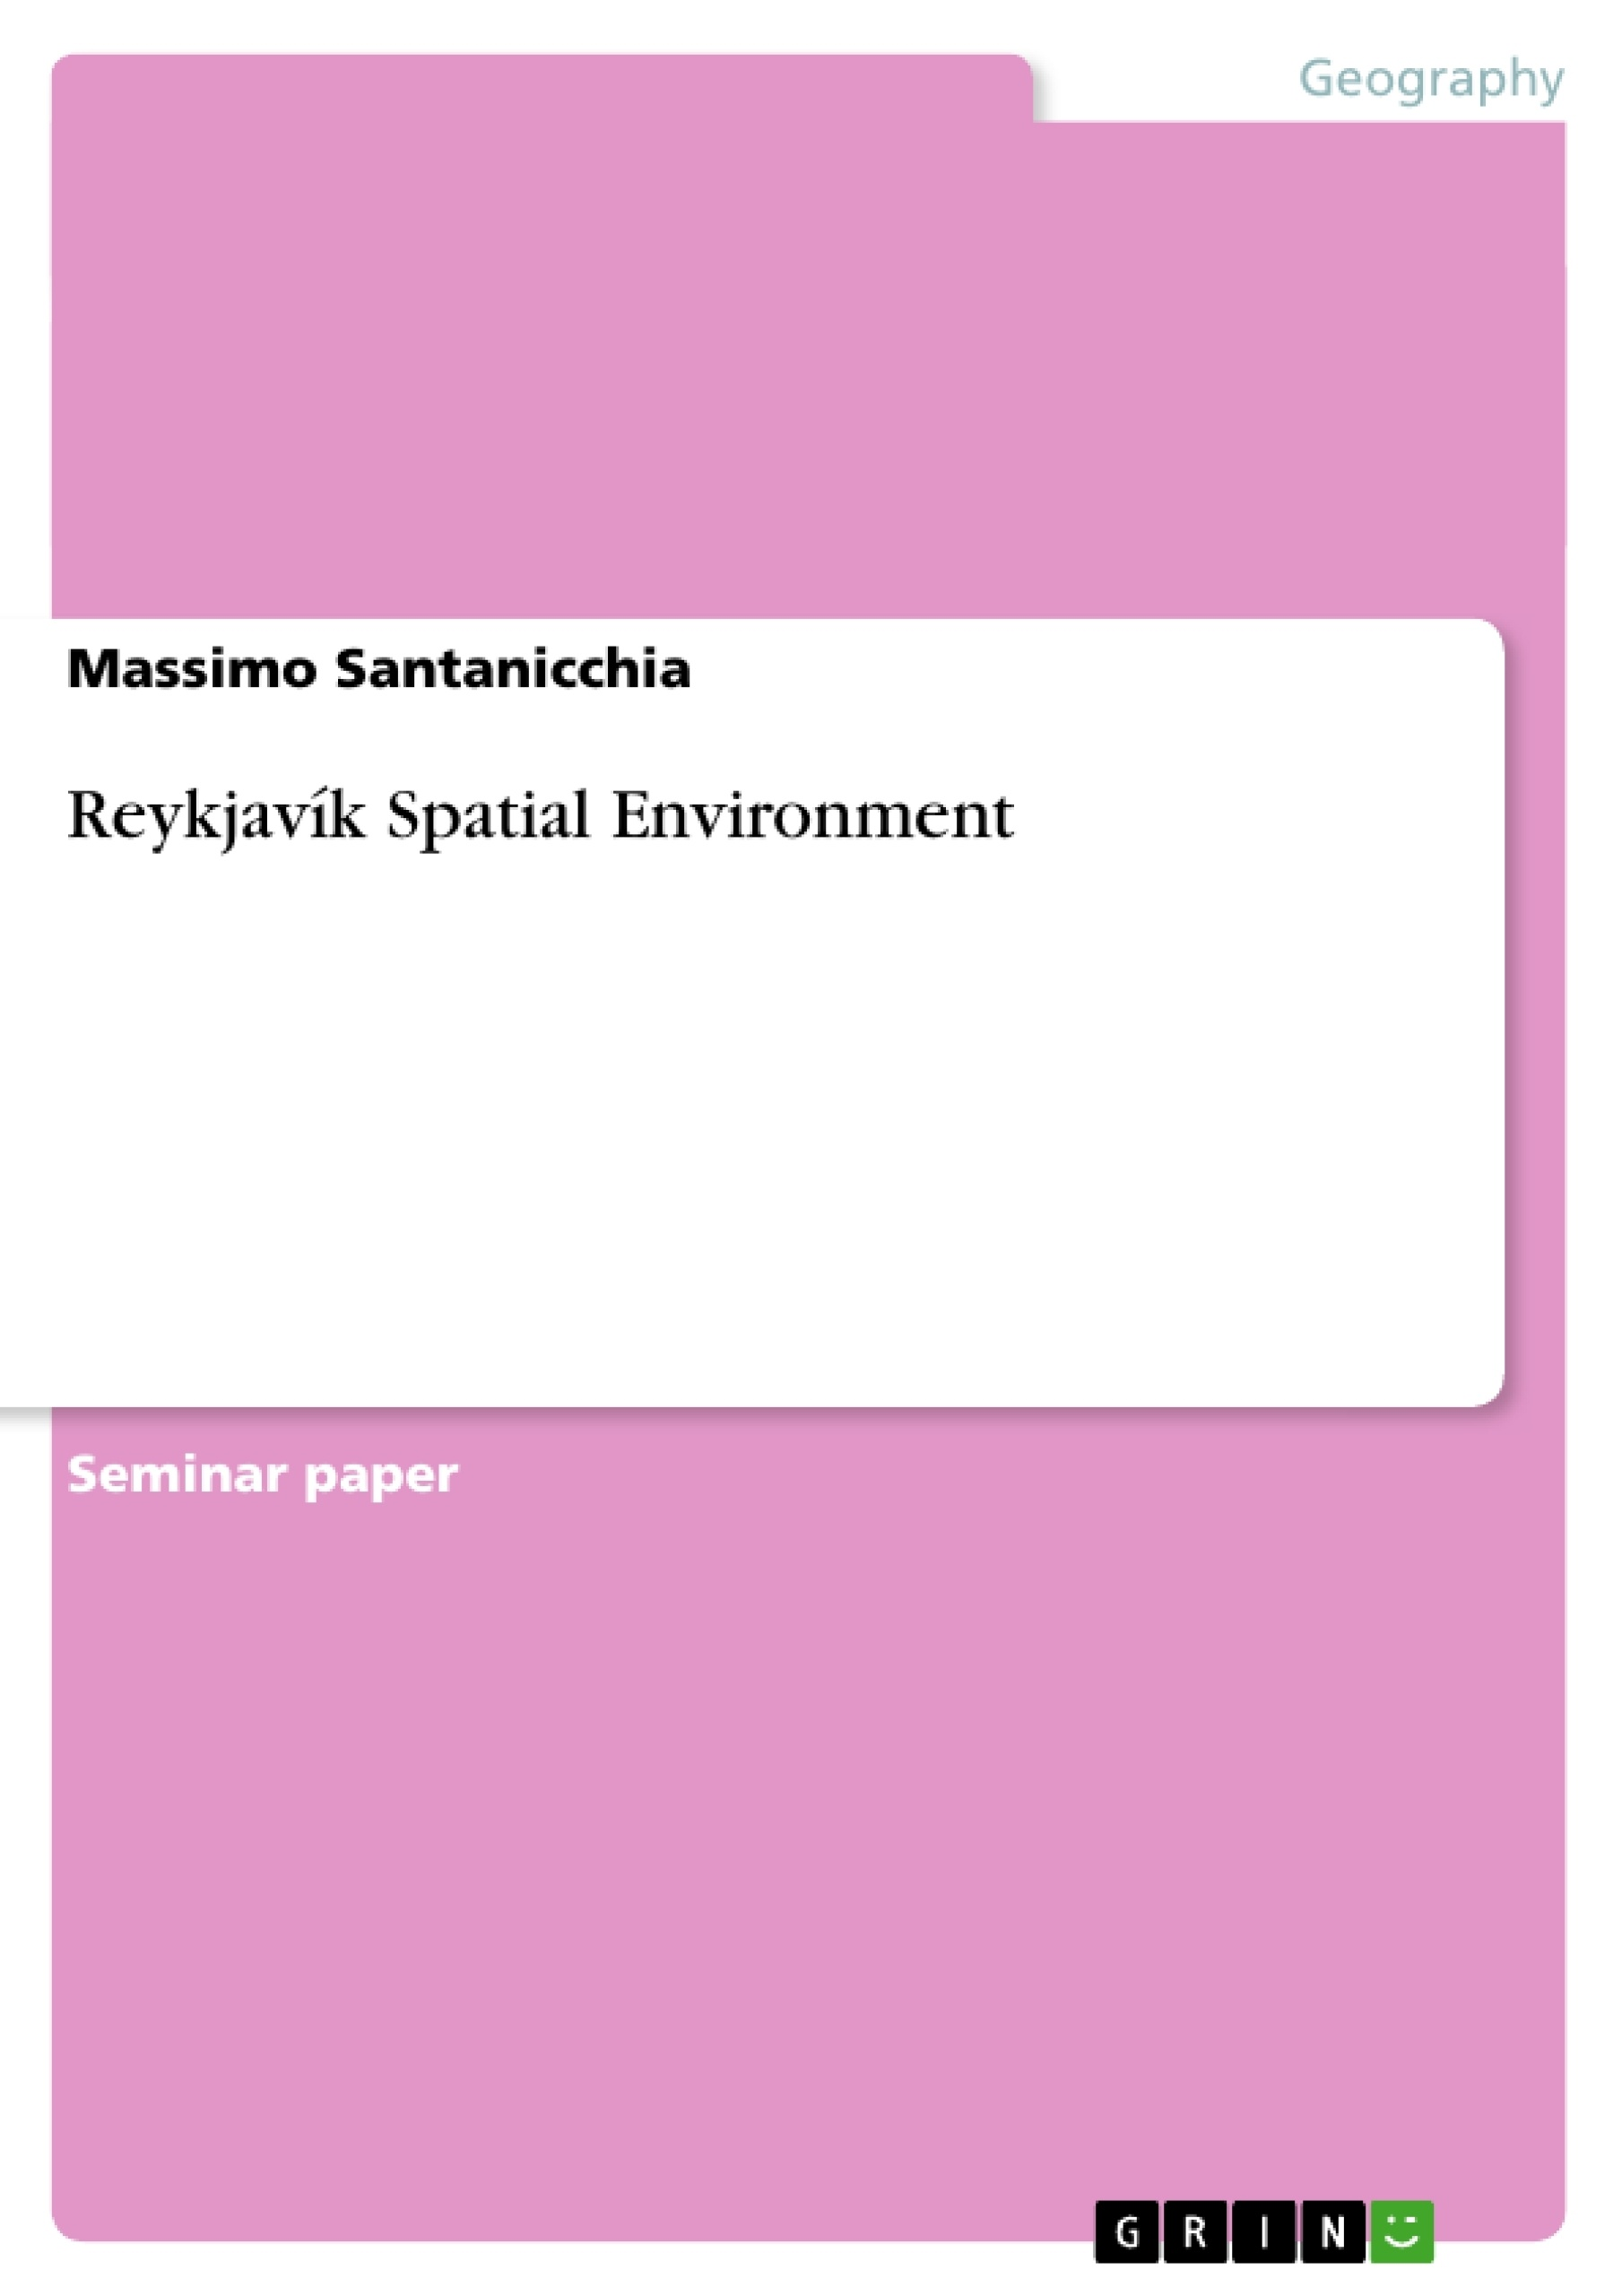 Title: Reykjavík Spatial Environment